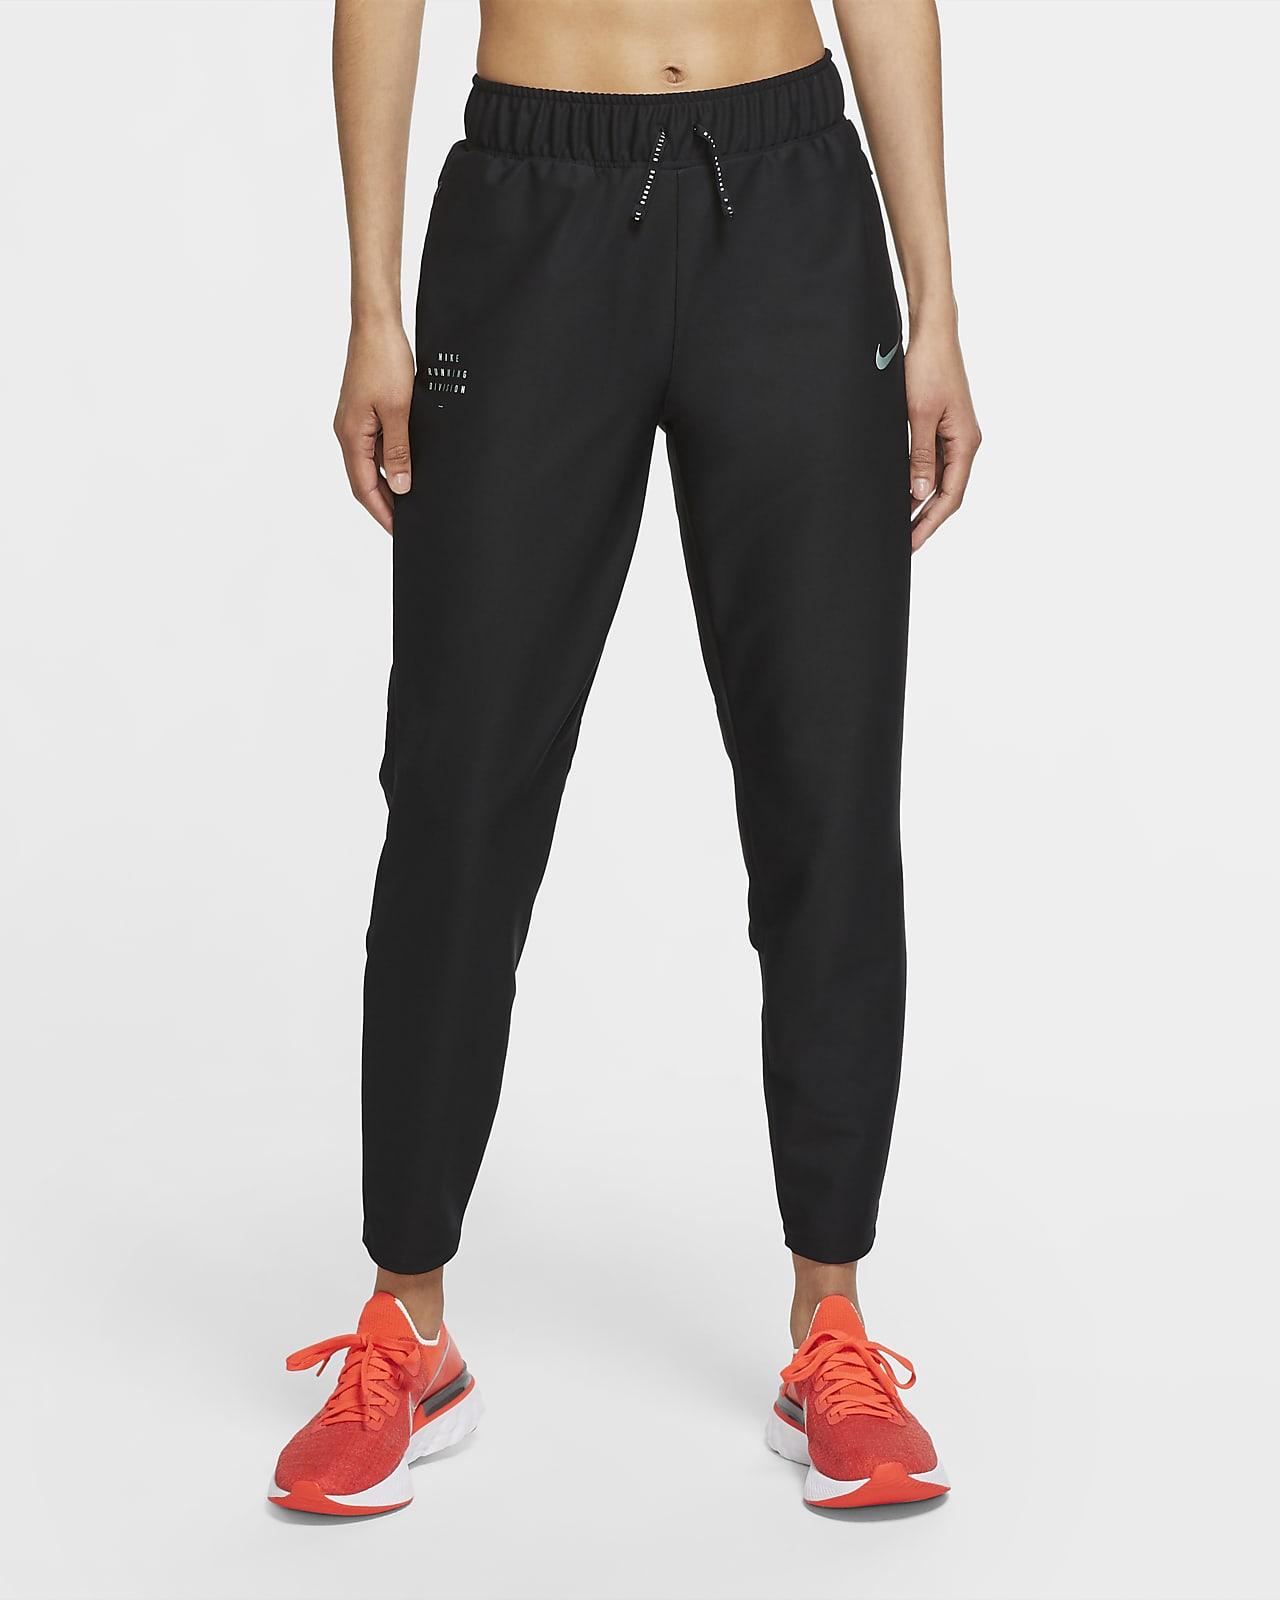 Pantalon de running Nike Shield Run Division pour Femme